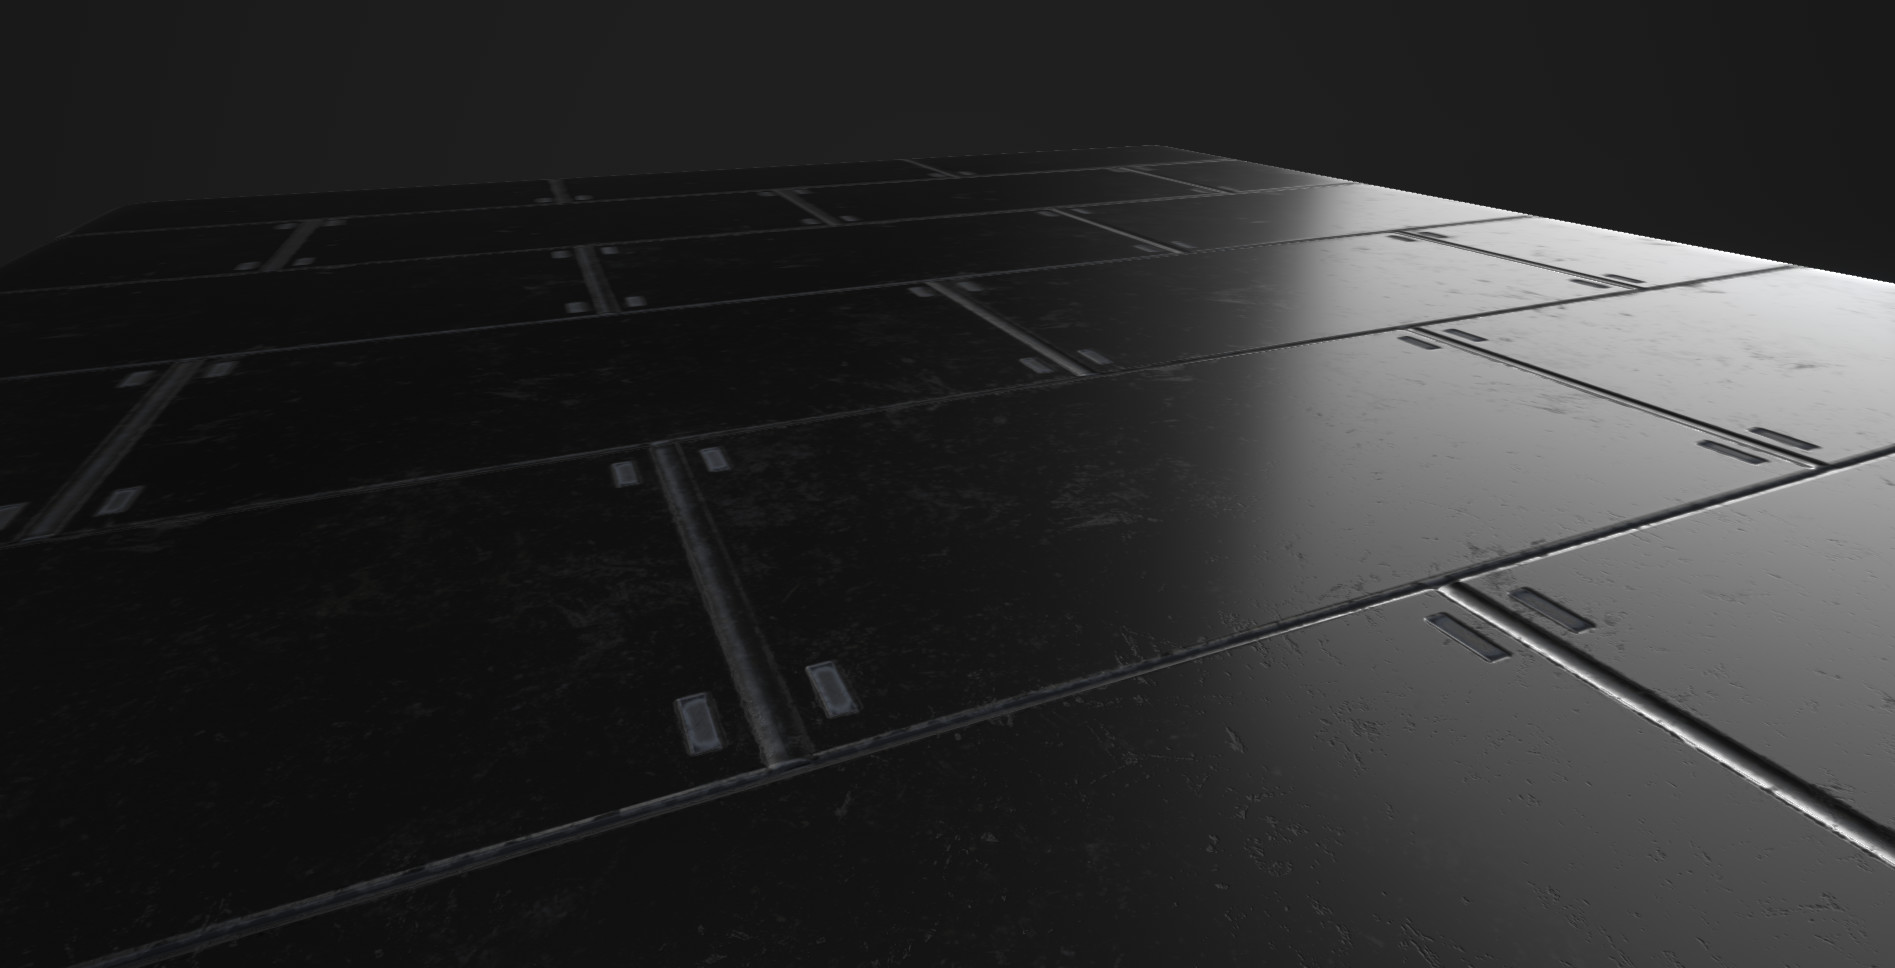 ArtStation - Imperial Hangar Floor